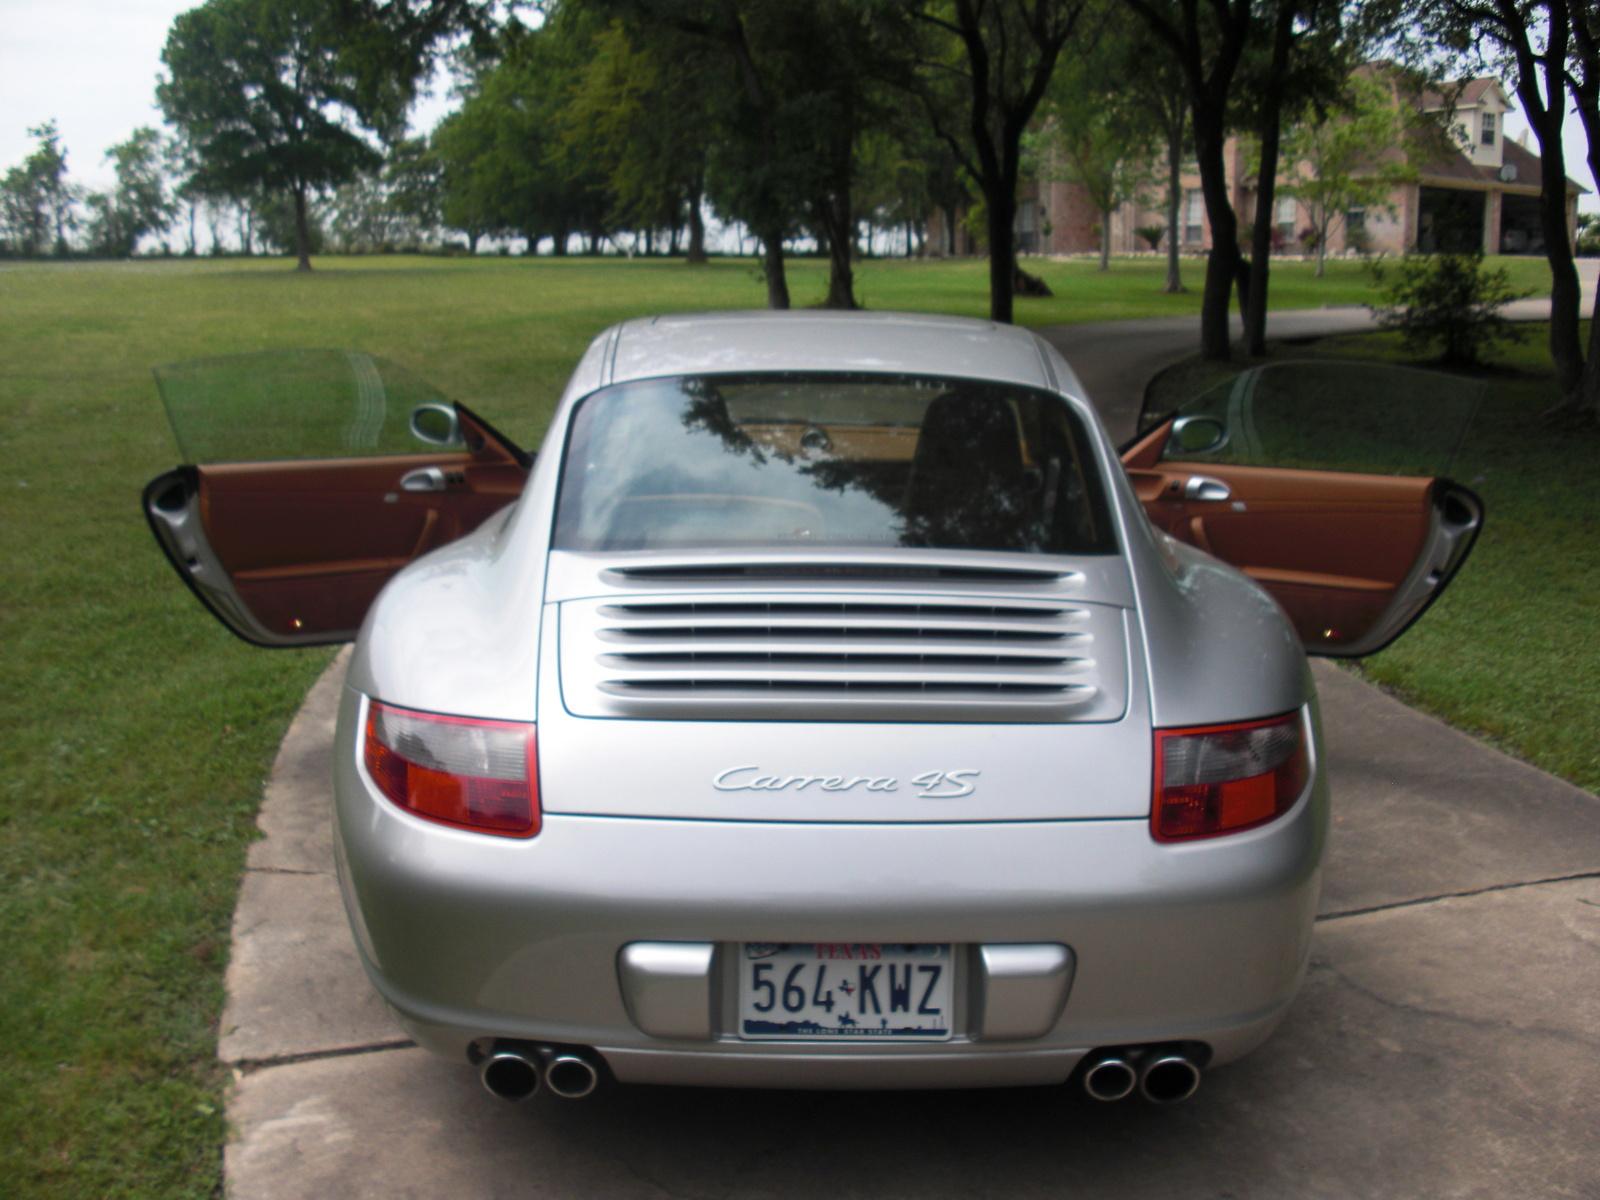 Porsche 911 Carrera 4S (2005)